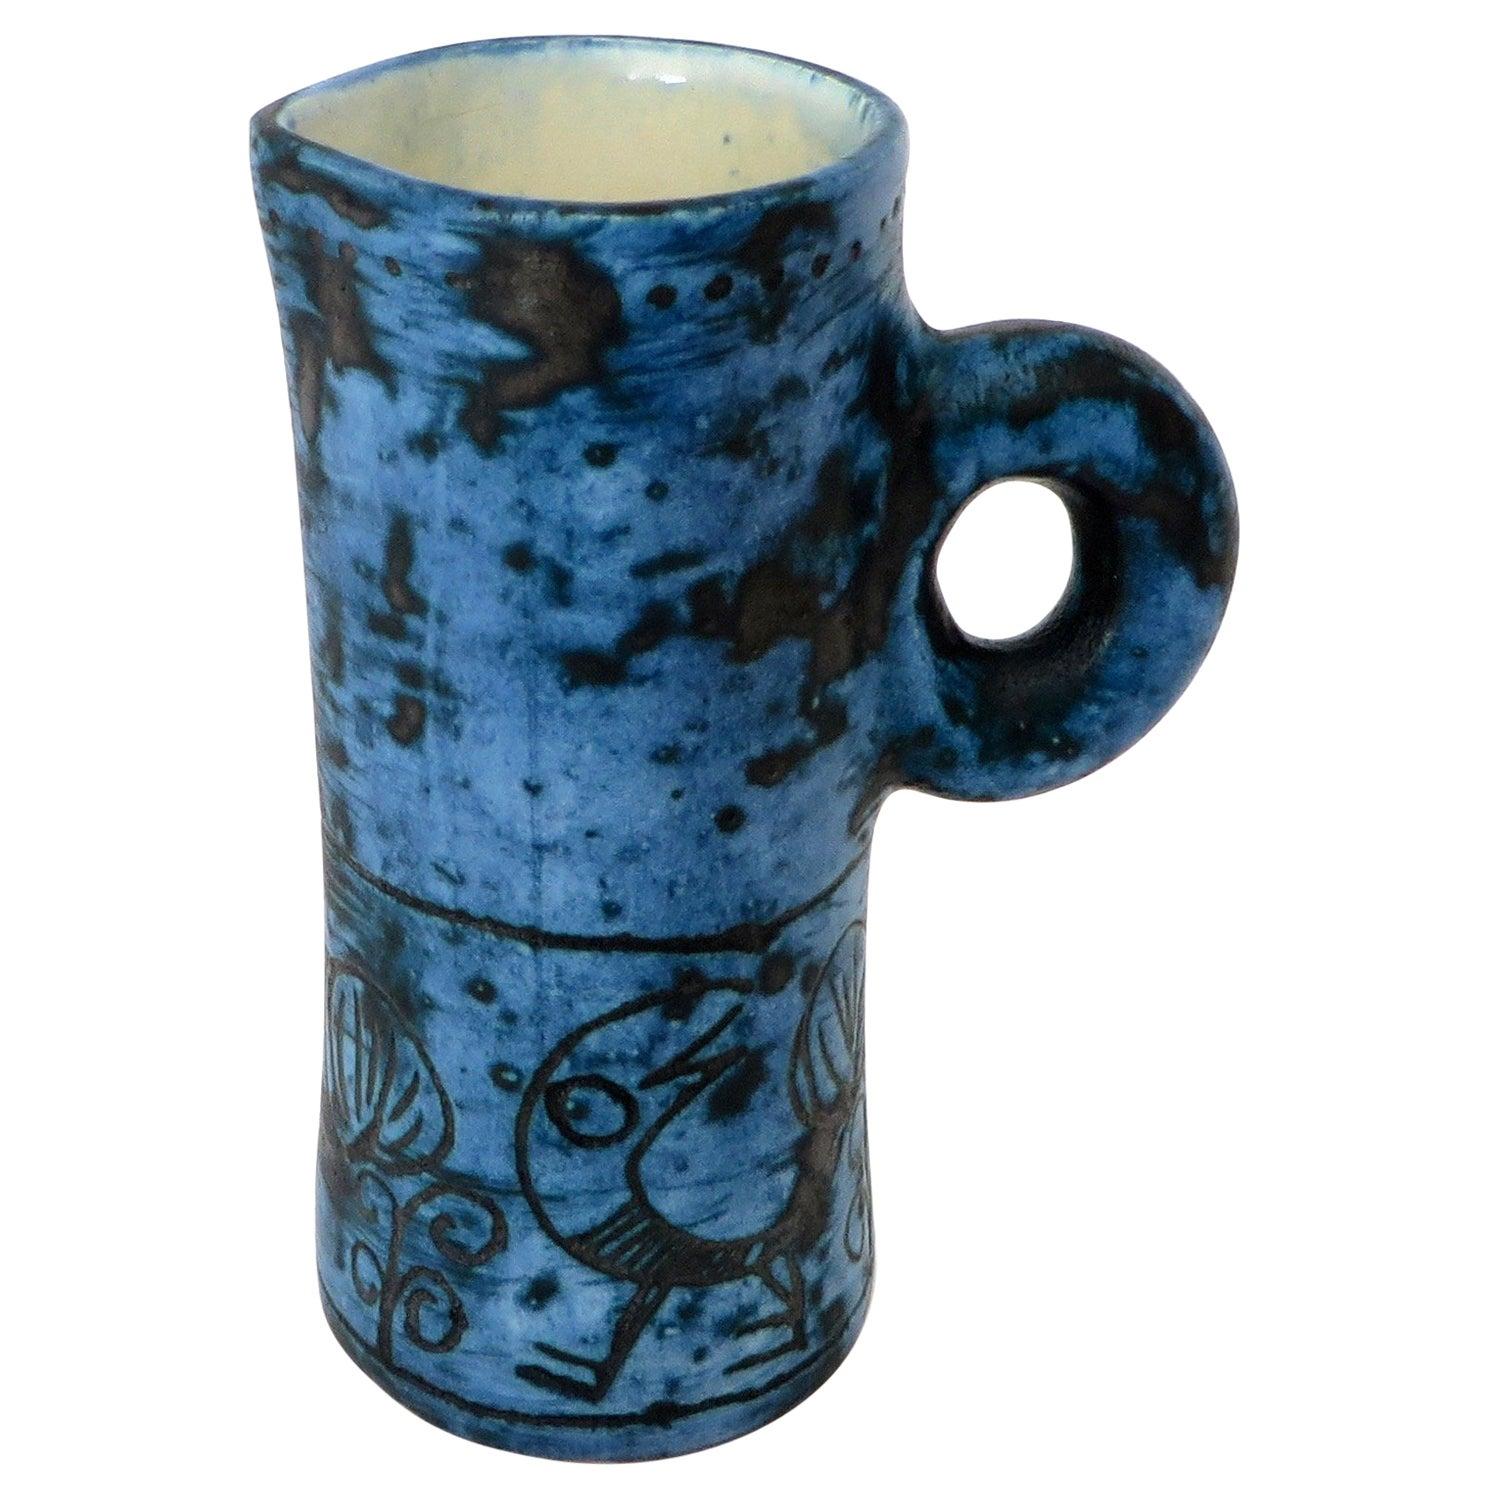 French Ceramic Artist Jacques Blin Dark Blue Sgraffito Ceramic Vase with Handle